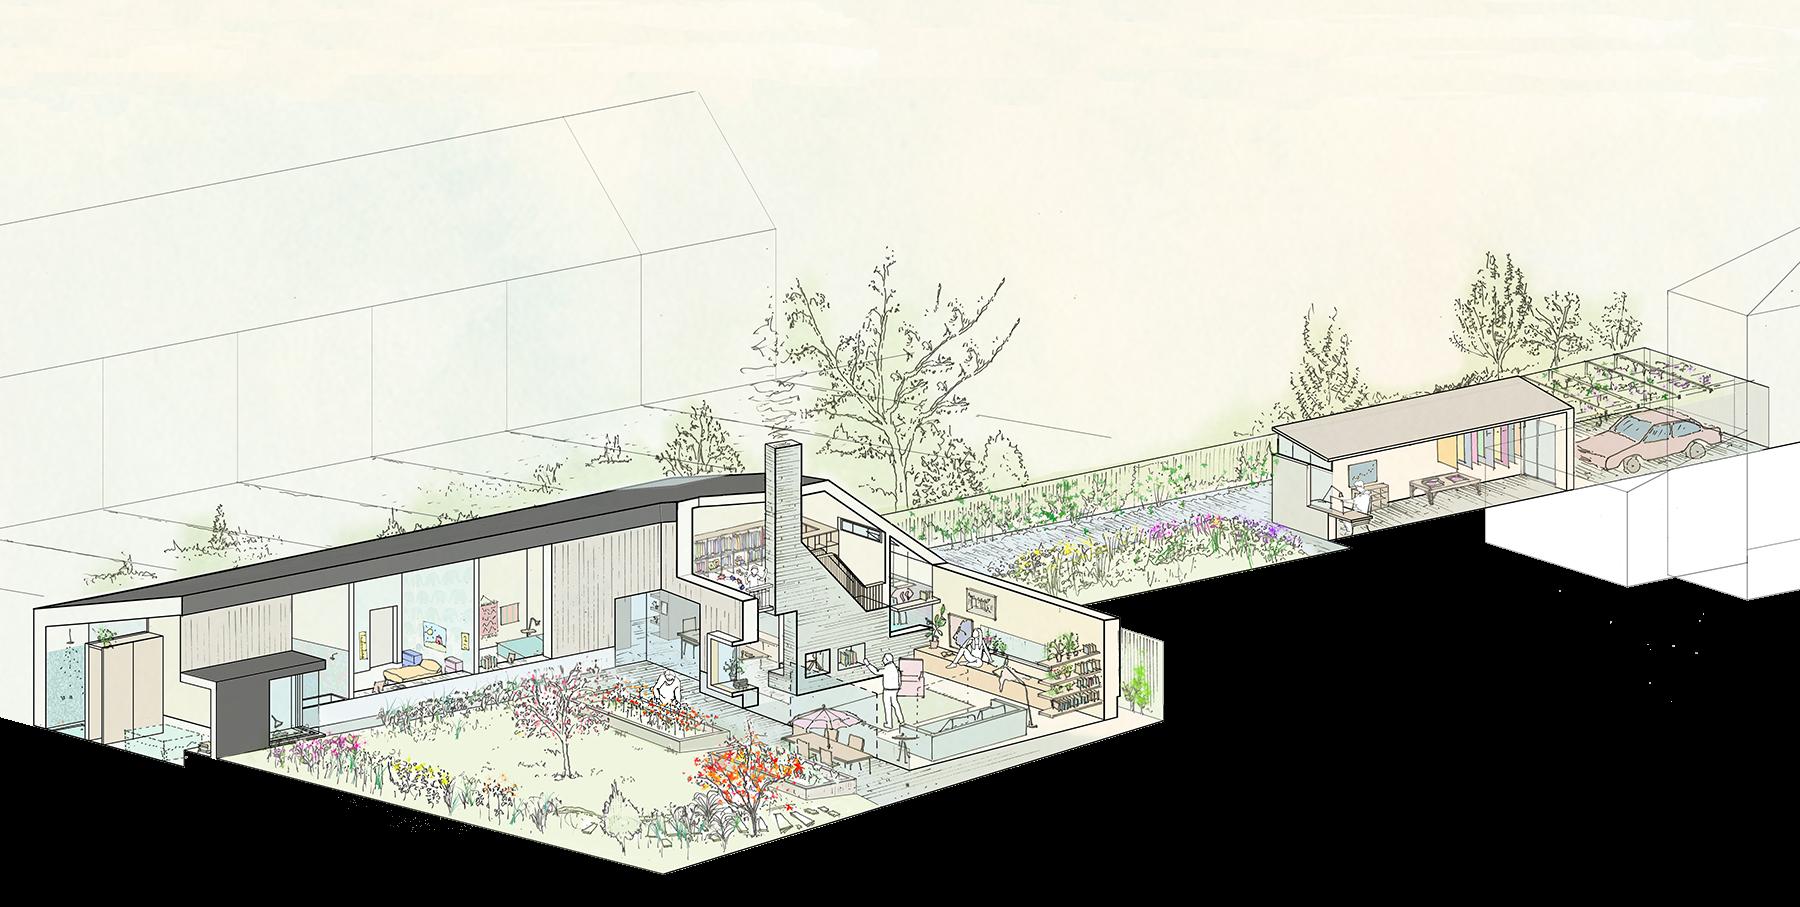 Sarah-Wigglesworth-Architects Haycroft-Gardens Overview-Year-5 1800